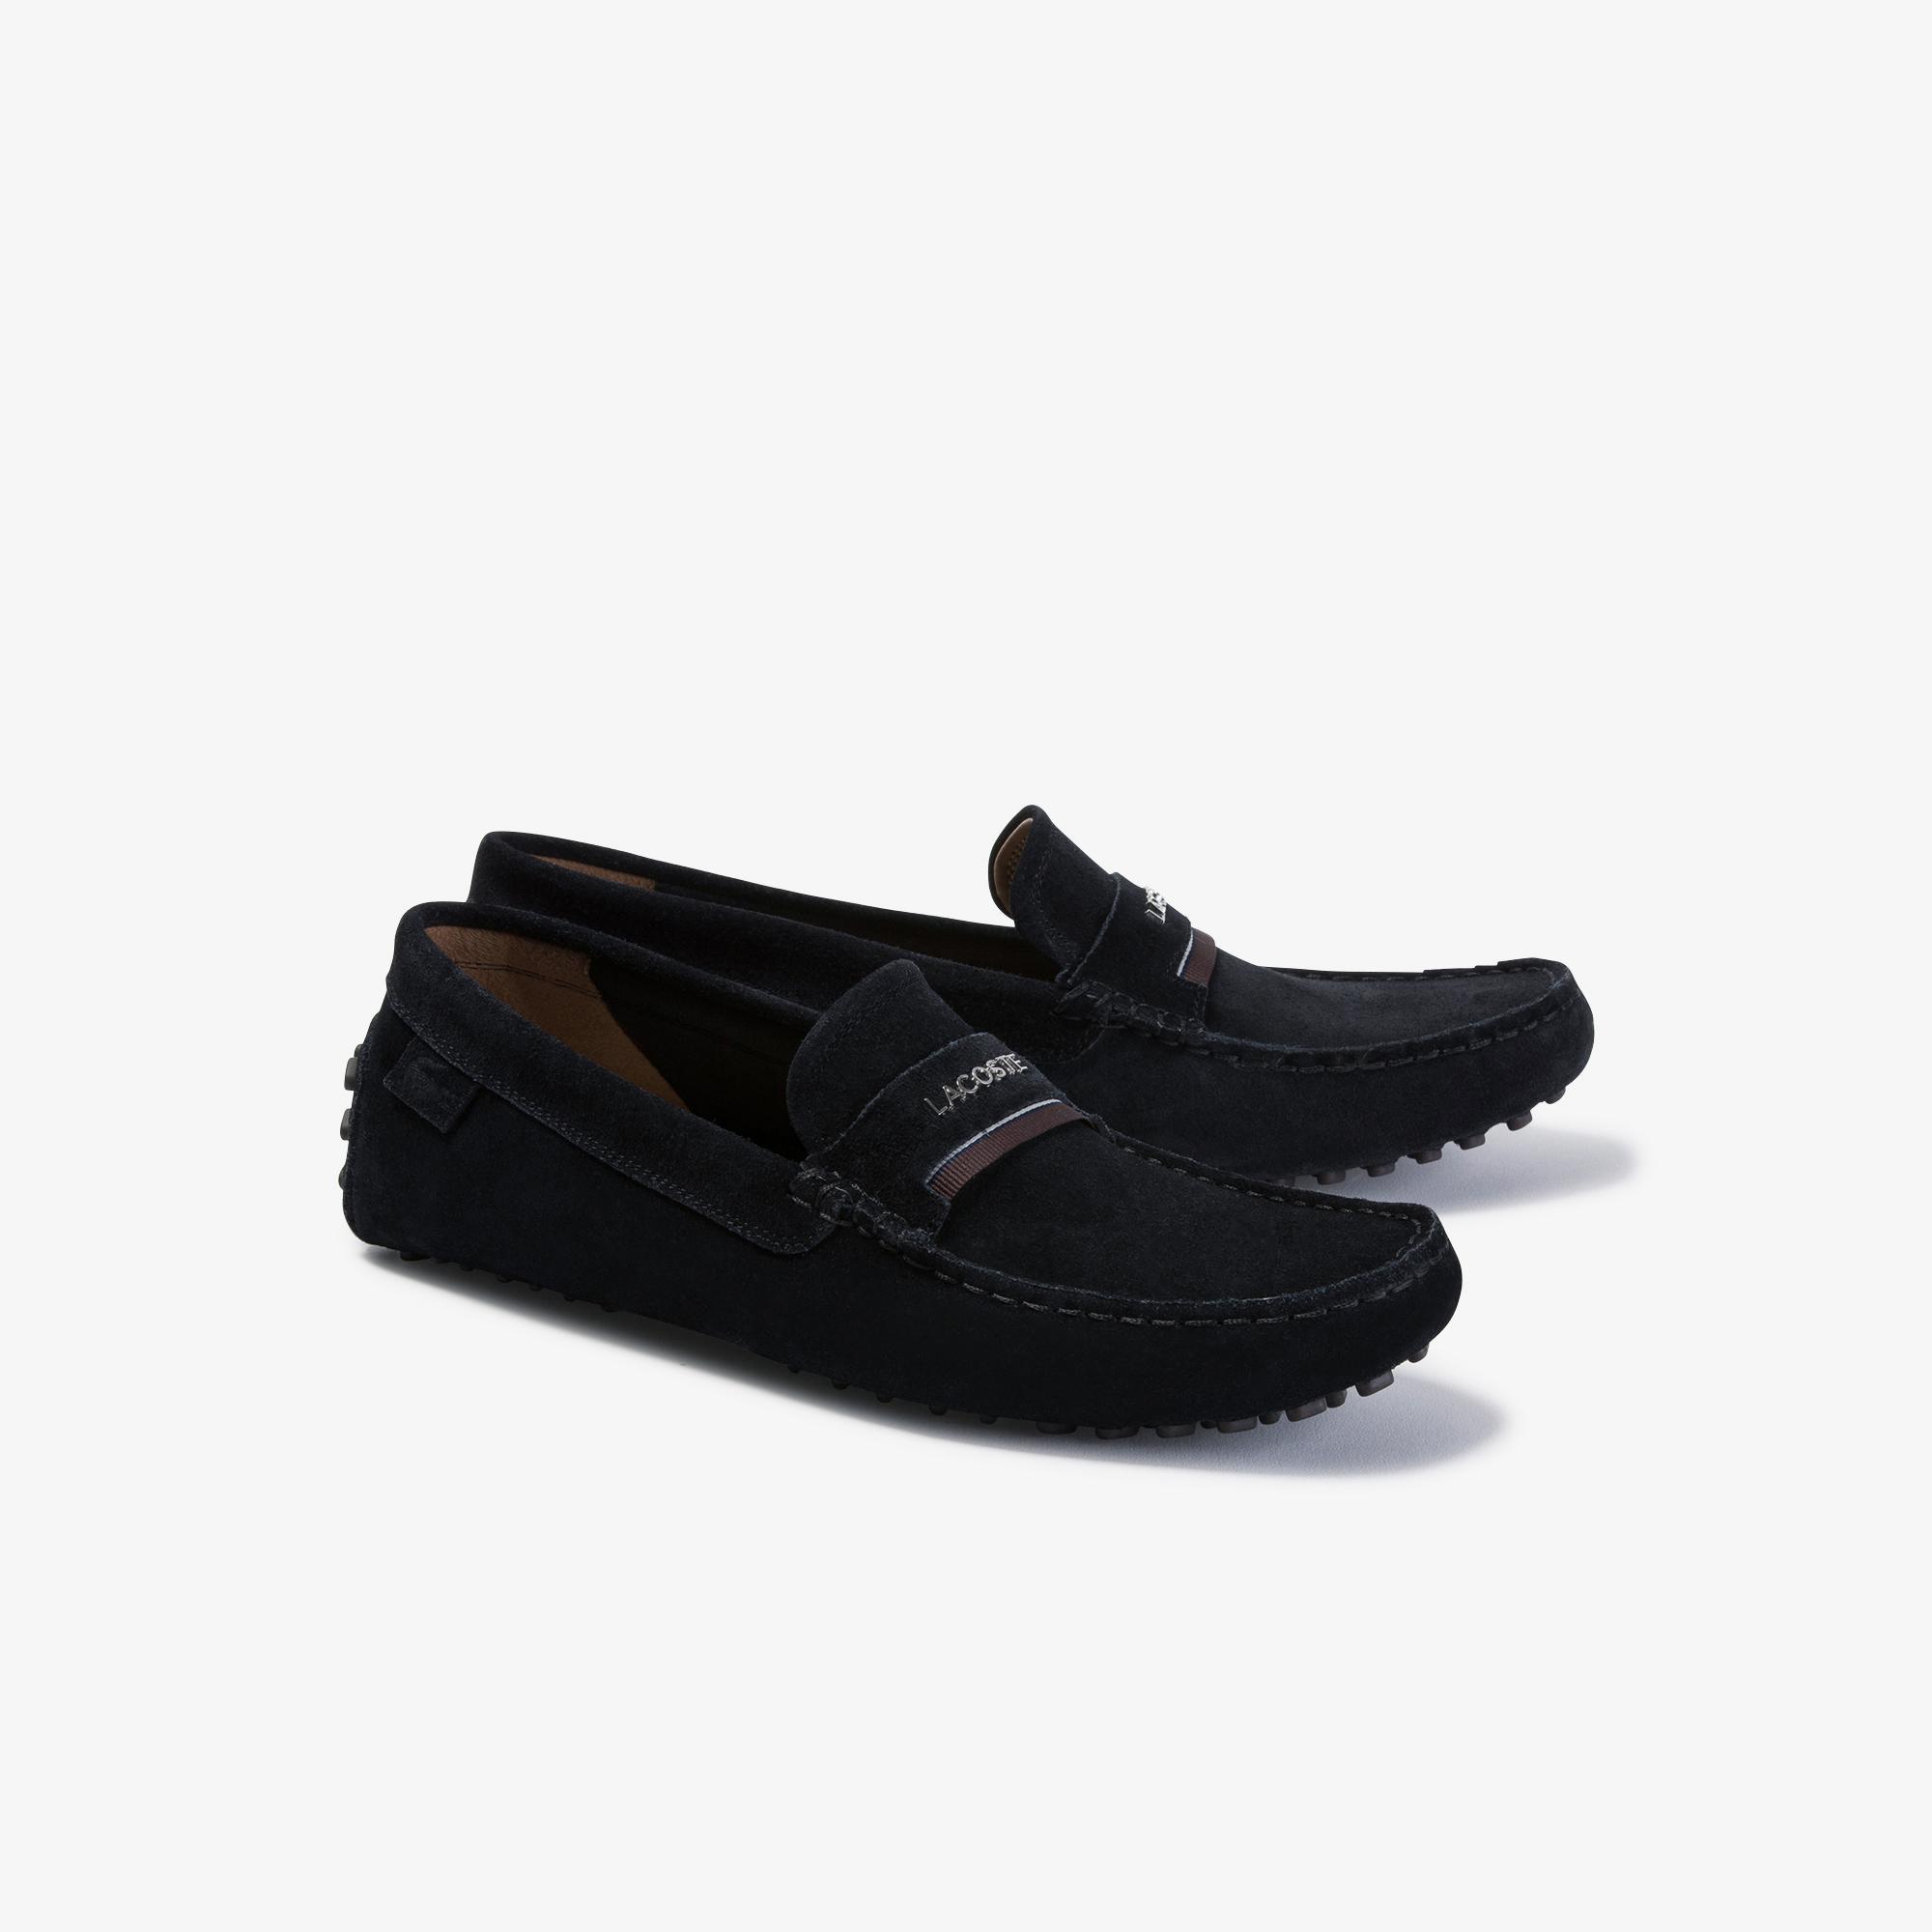 Lacoste Plaisance 120 1 Cma Erkek Siyah-Koyu Kahverengi Casual Ayakkabı